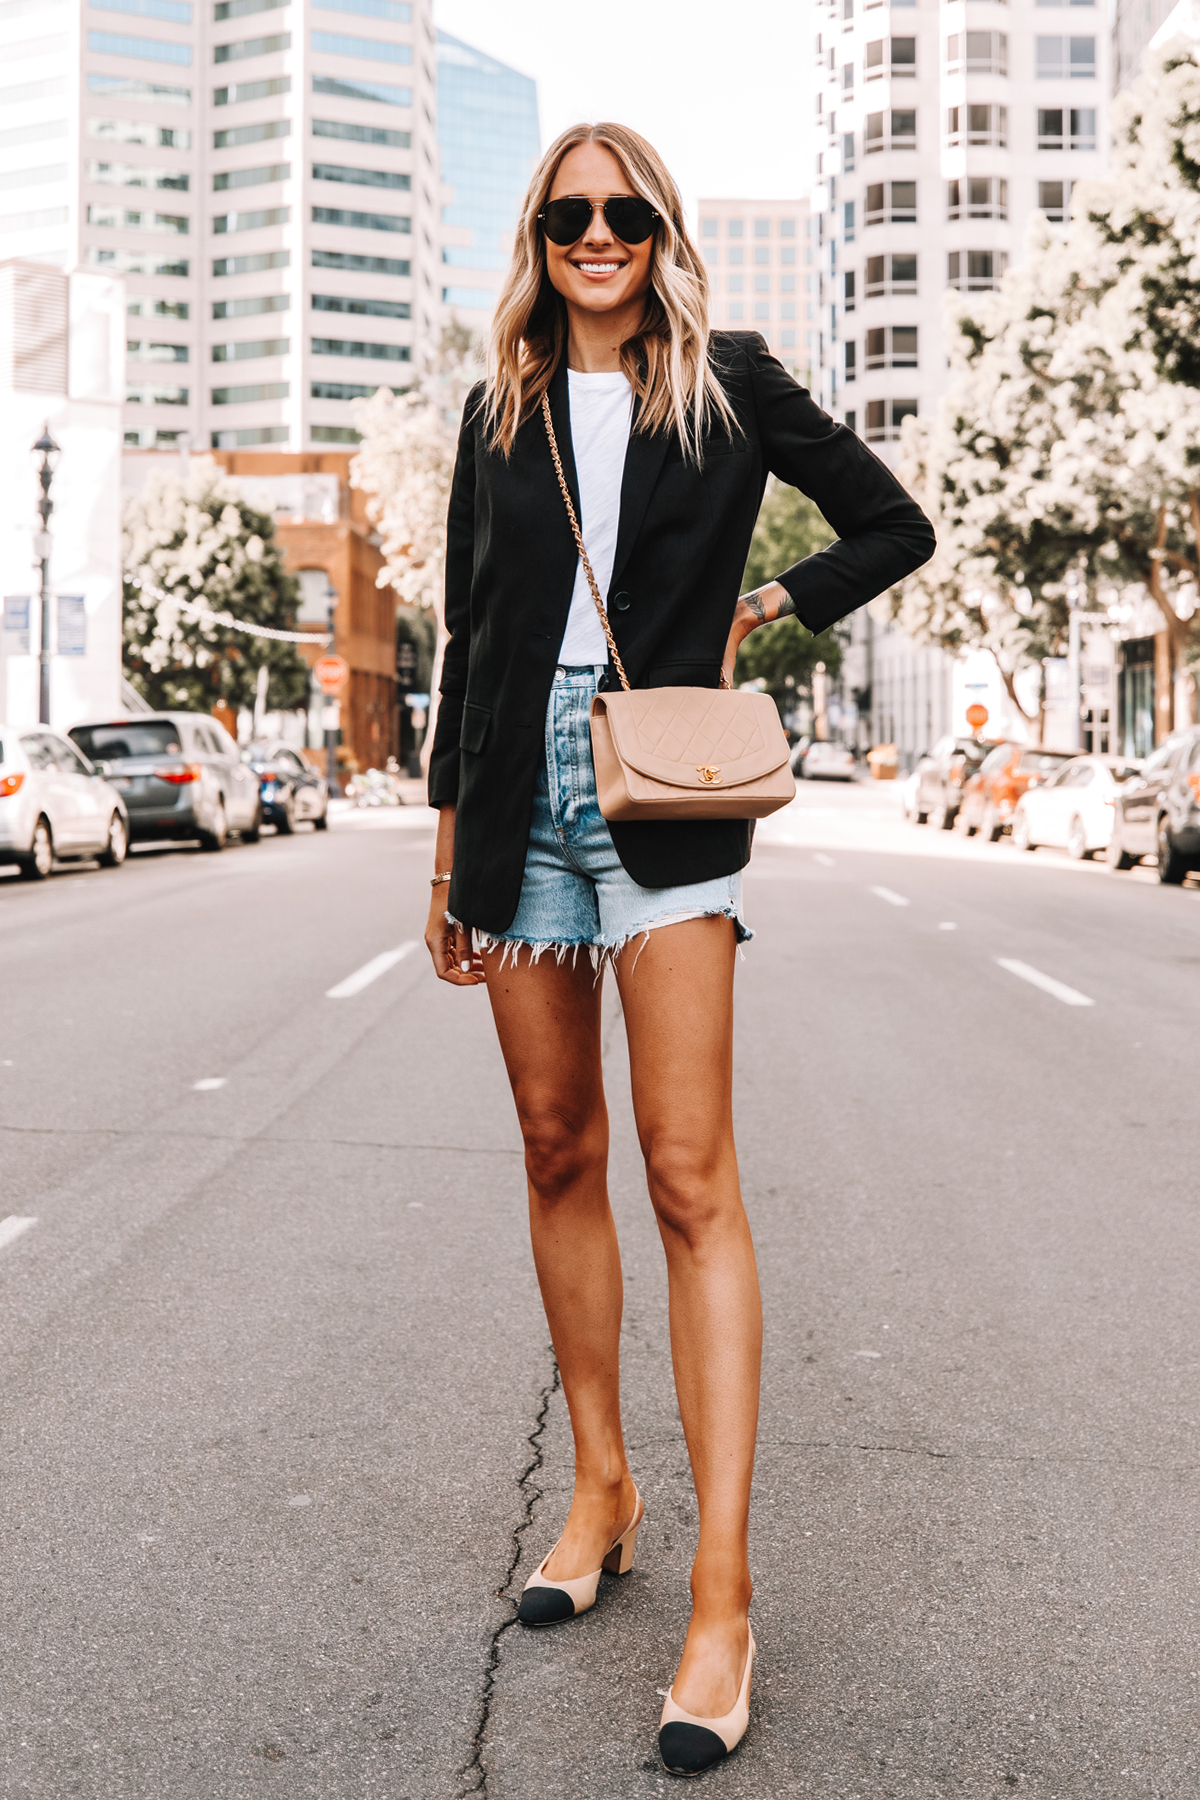 Fashion Jackson Wearing Everlane Black Blazer White Tshirt High Rise Denim Shorts Chanel Slingbacks Beige Chanel Handbag Street Style 1